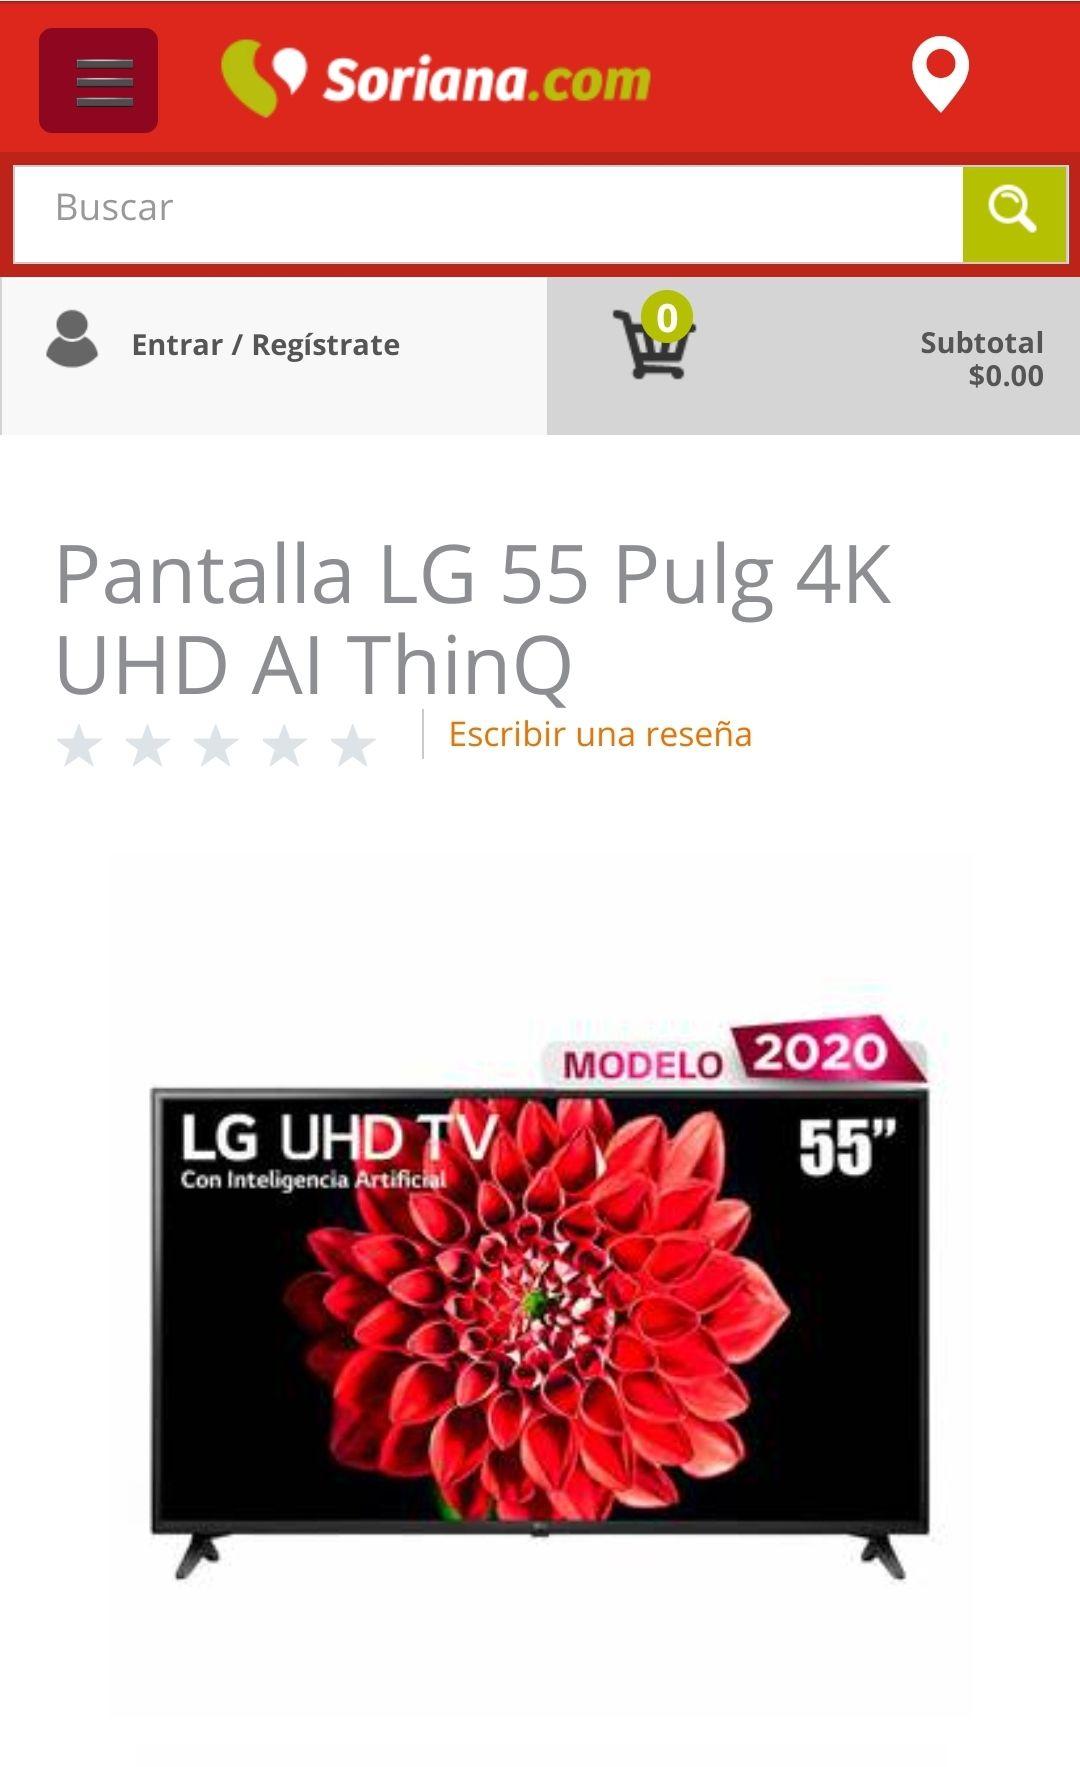 Soriana: LG 55 Pulg 4K UHD AI ThinQ